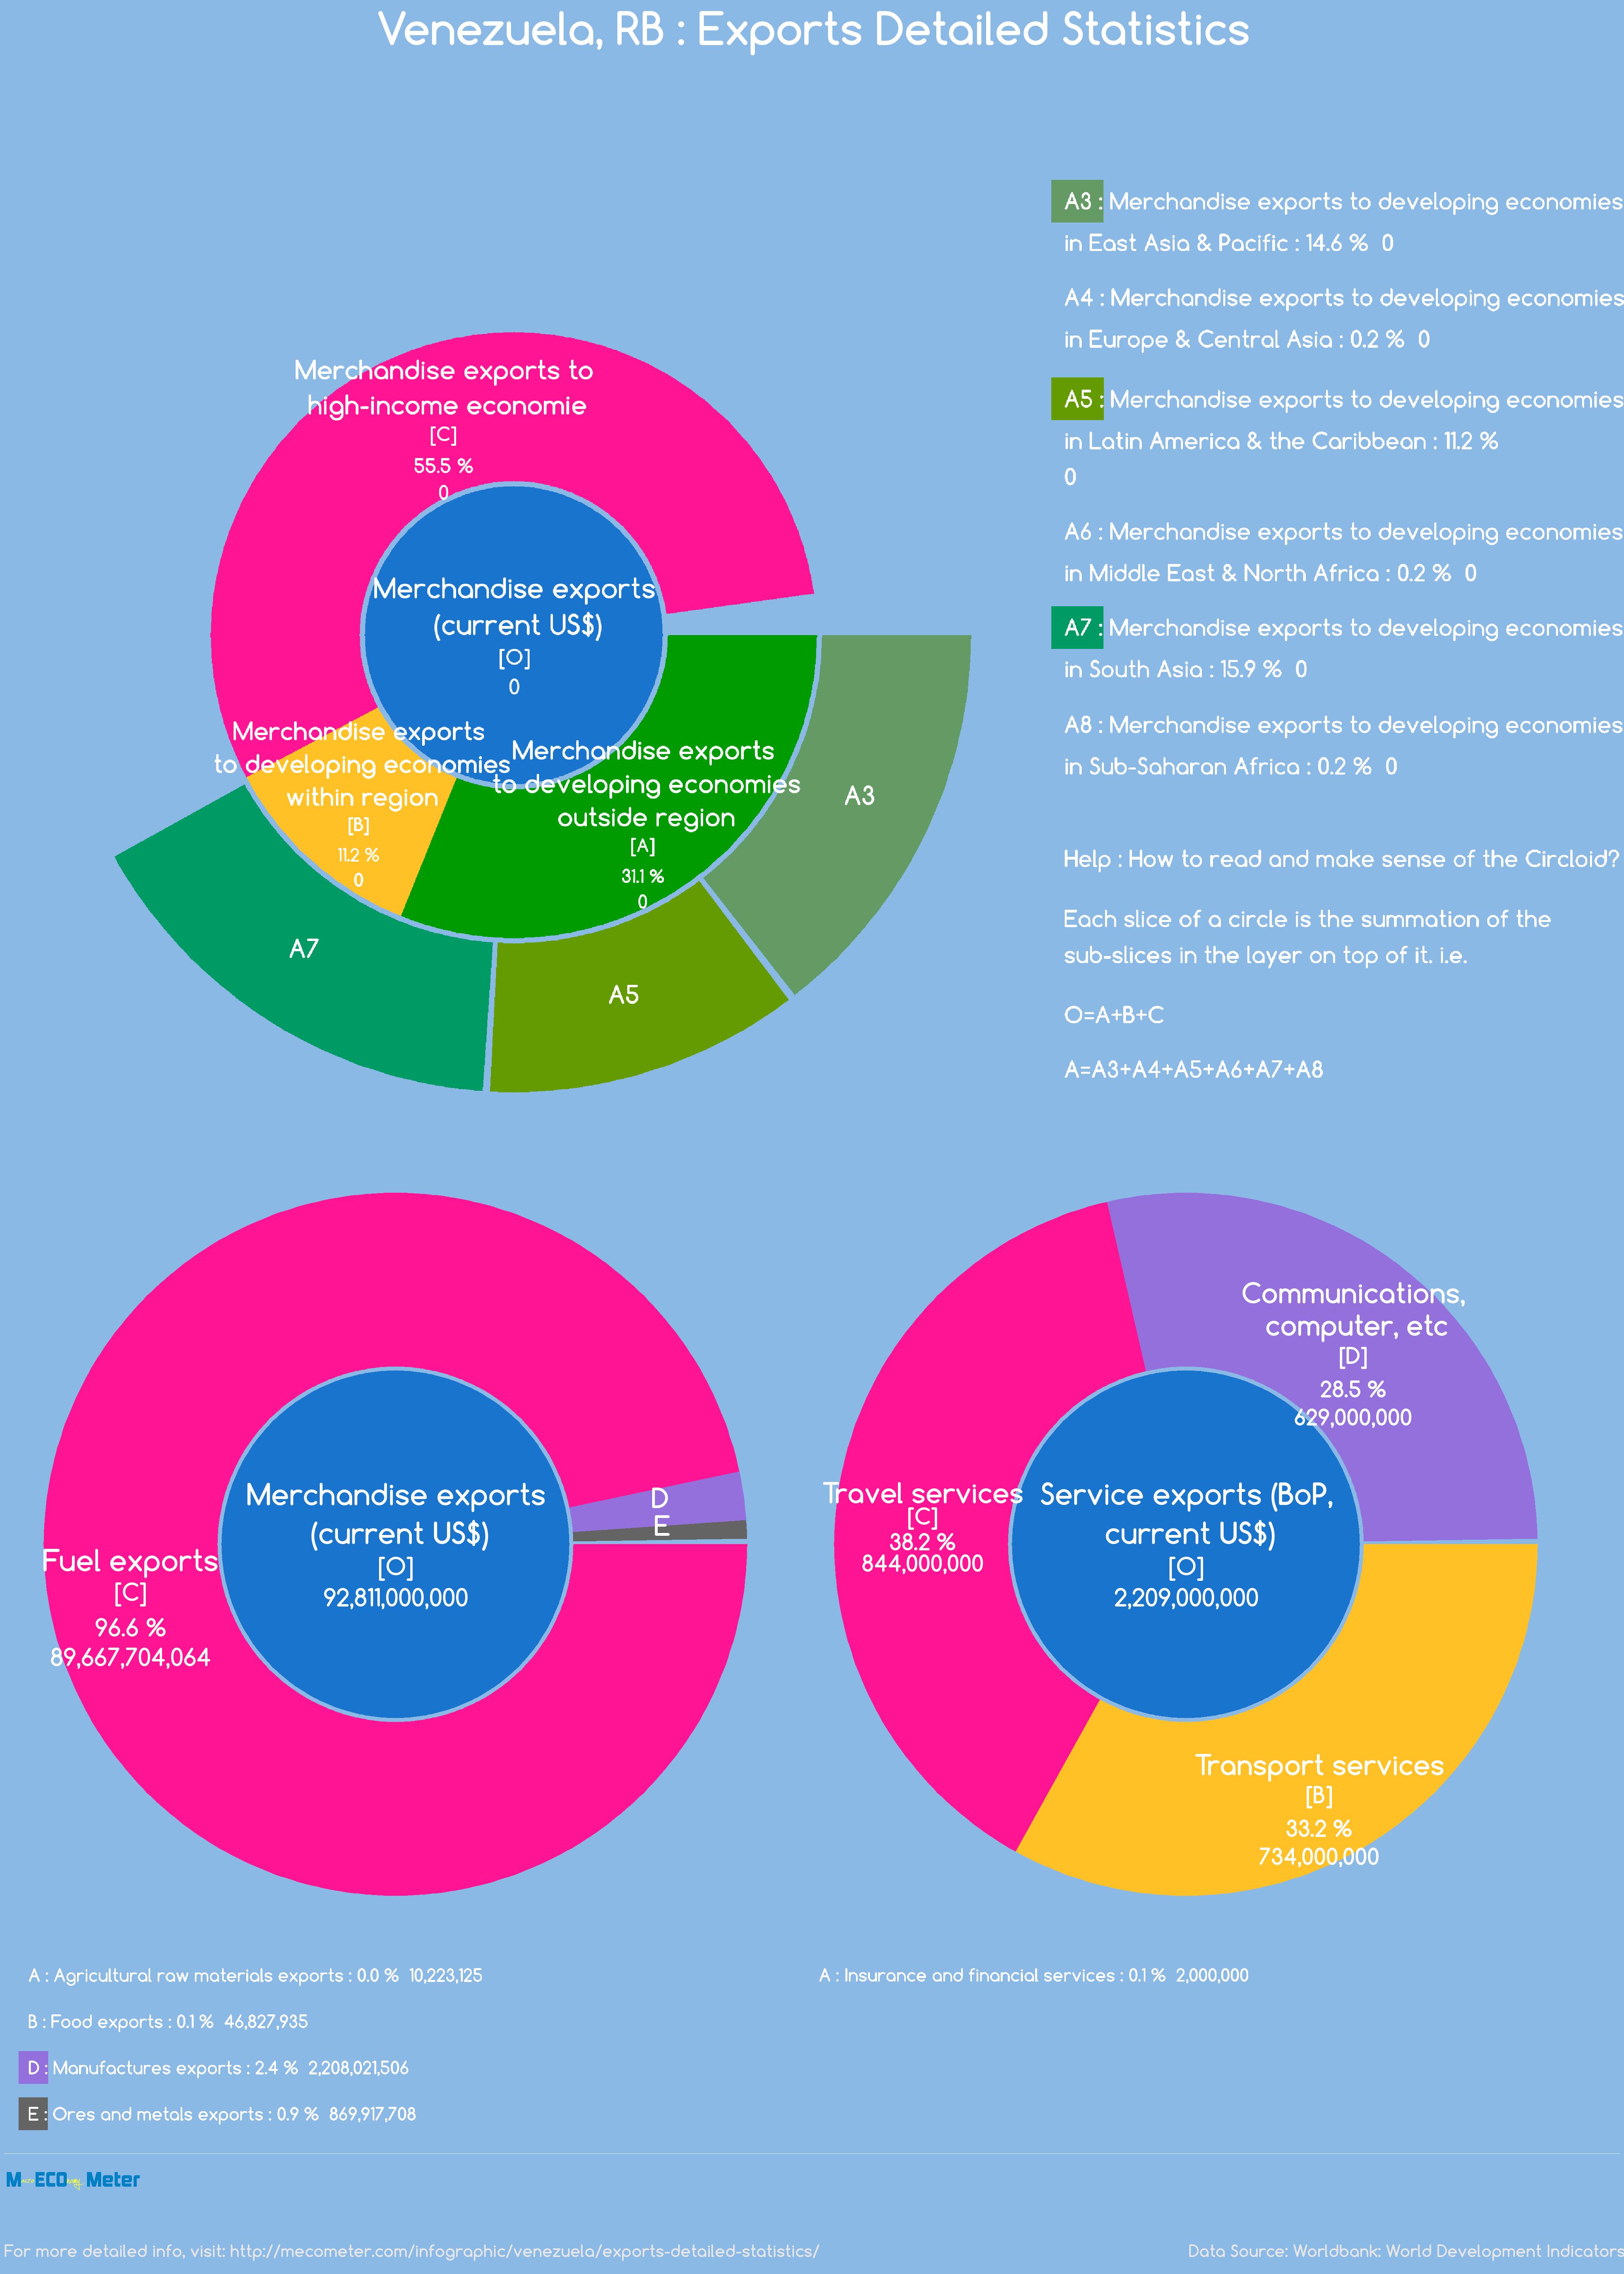 Venezuela, RB : Exports Detailed Statistics